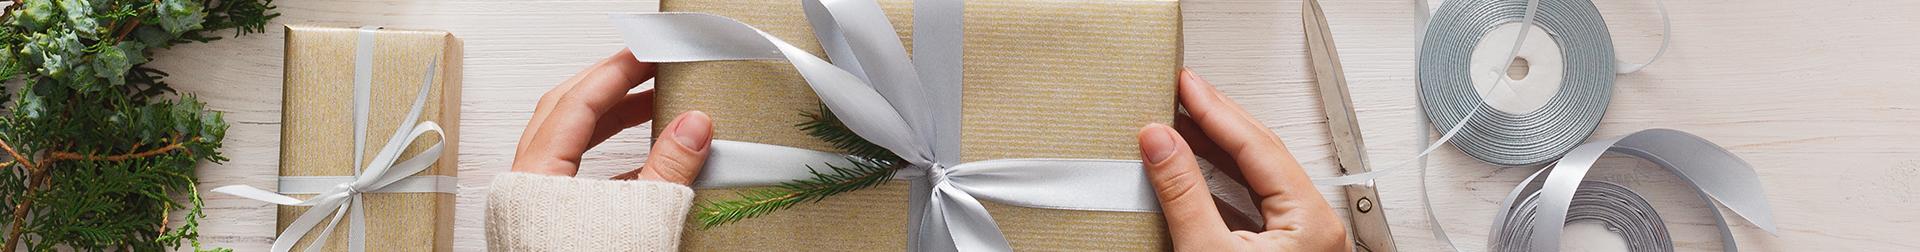 Gift Sets   Buy Best Gift Sets For Women   Aromacraze.com